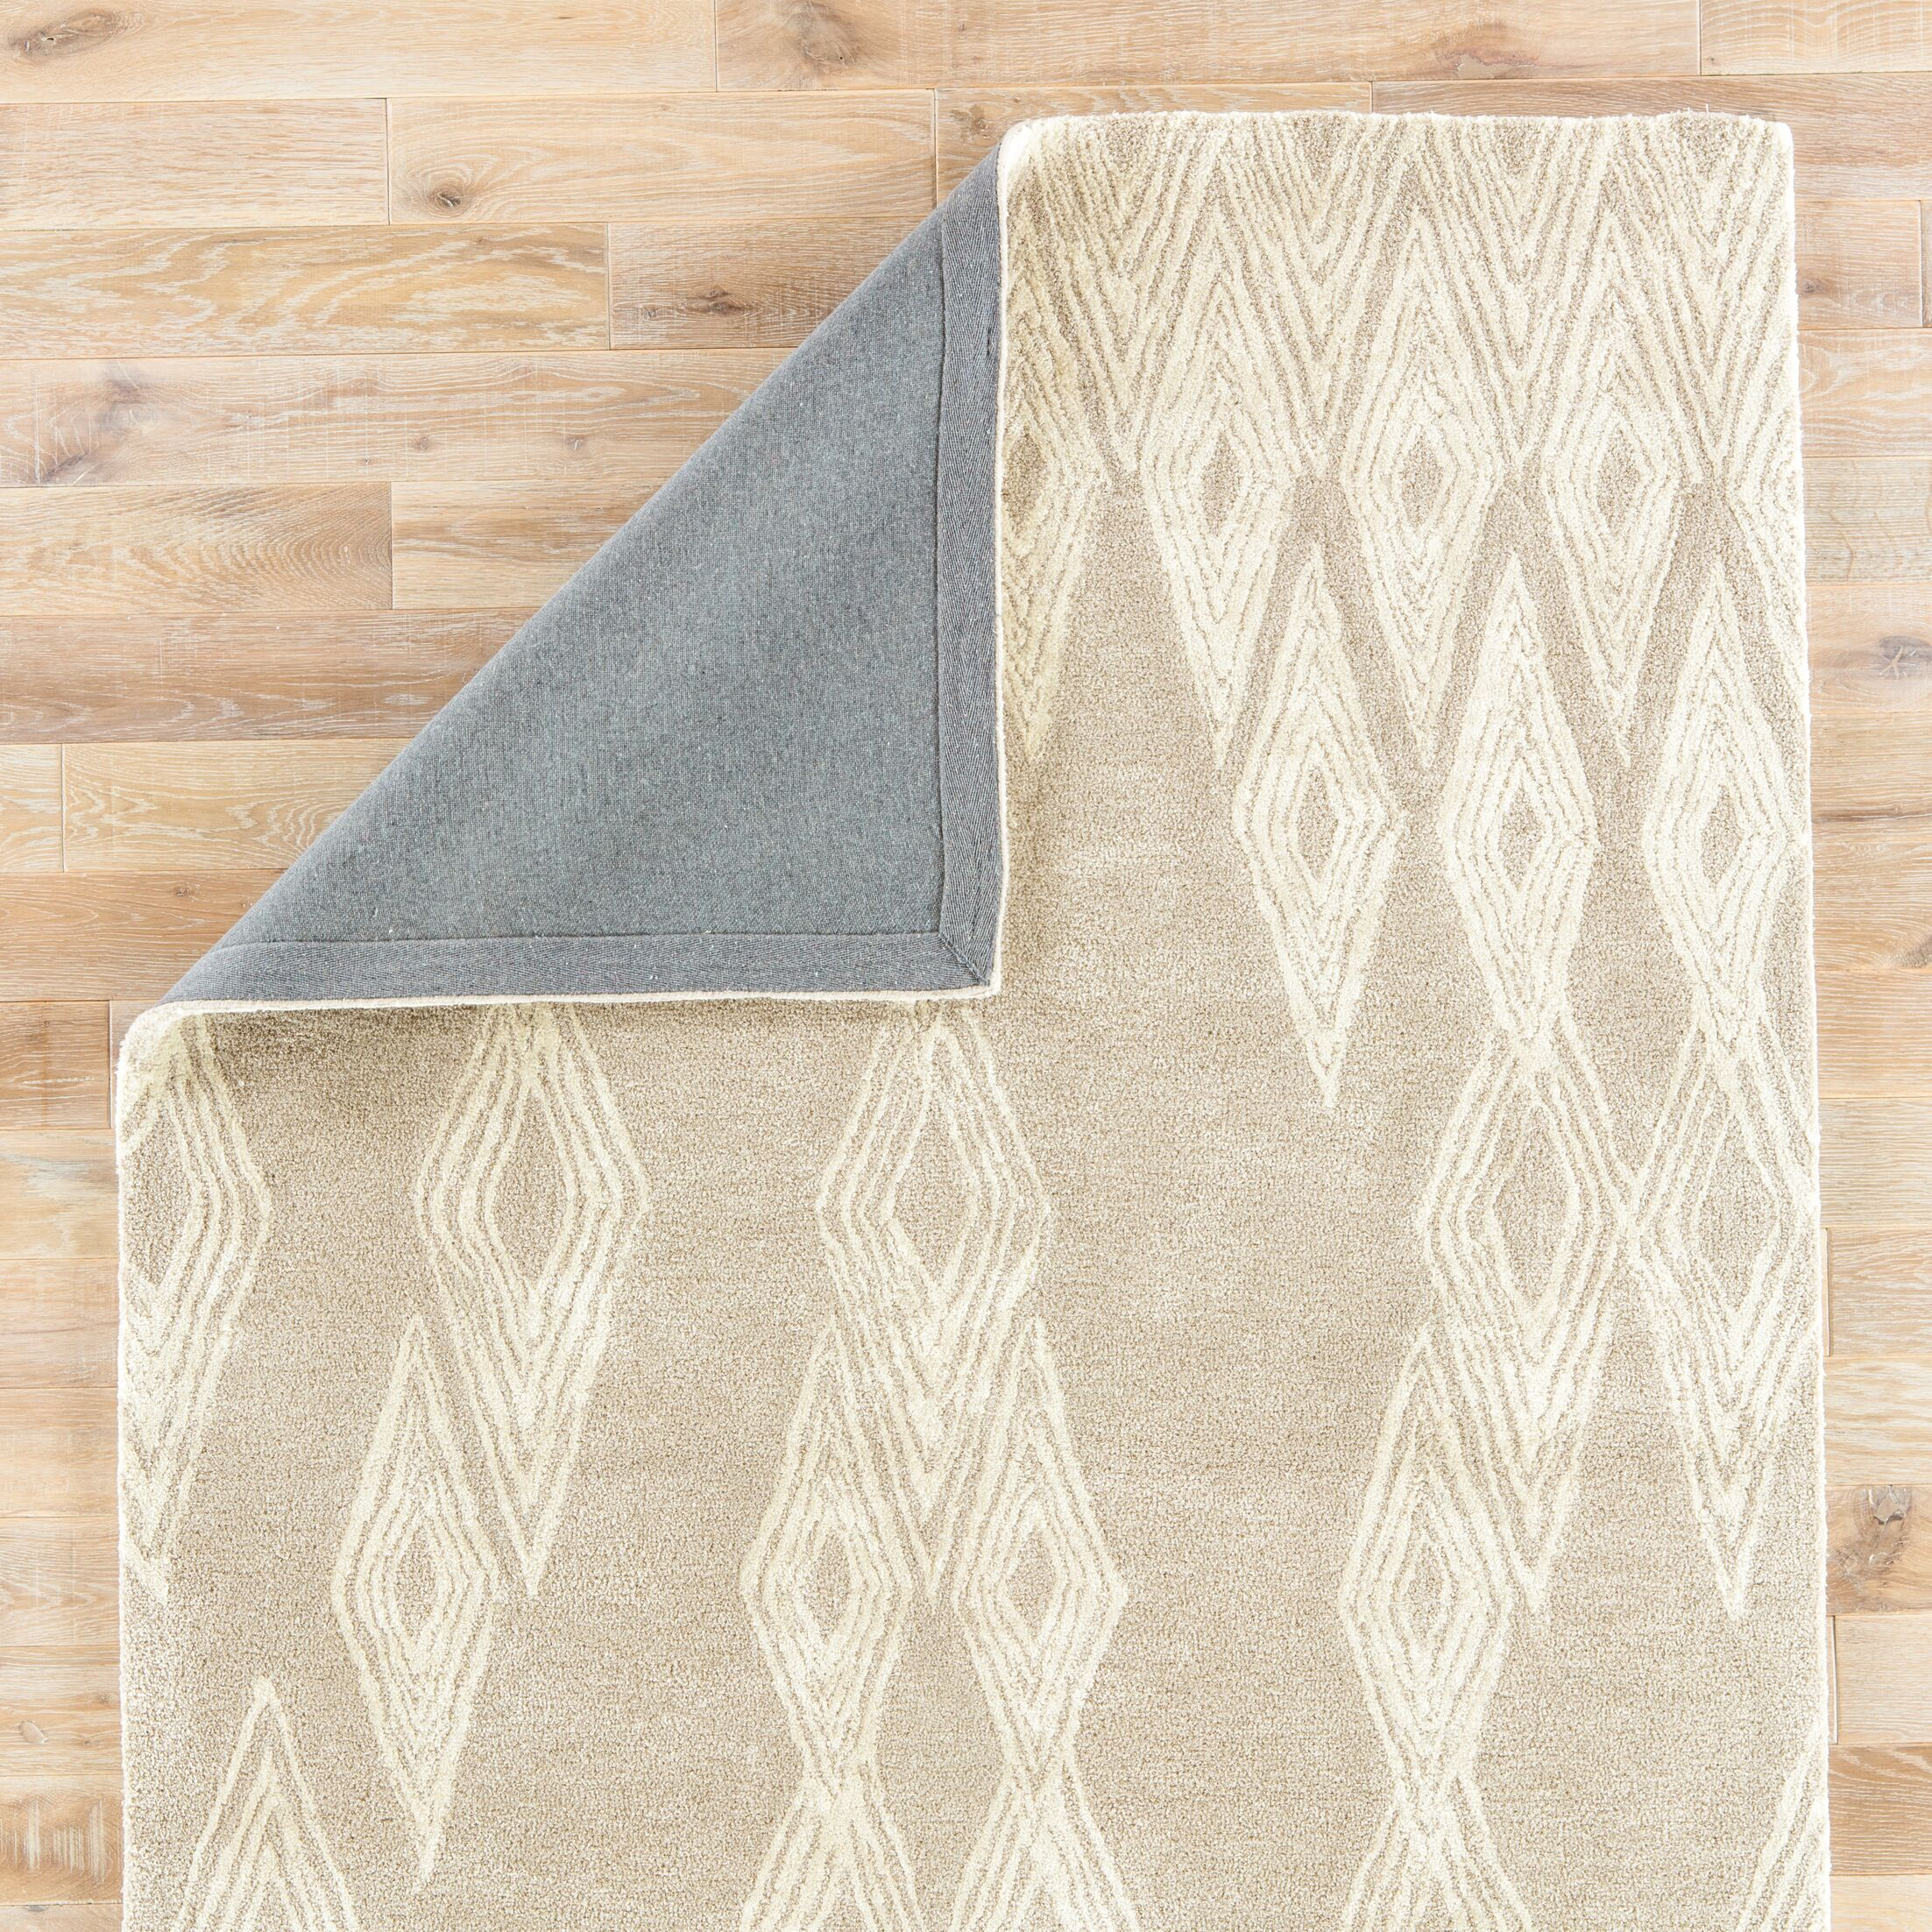 Bourassa Geometric Handmade Gray Area Rug Rug Size: Rectangle 5' x 8'